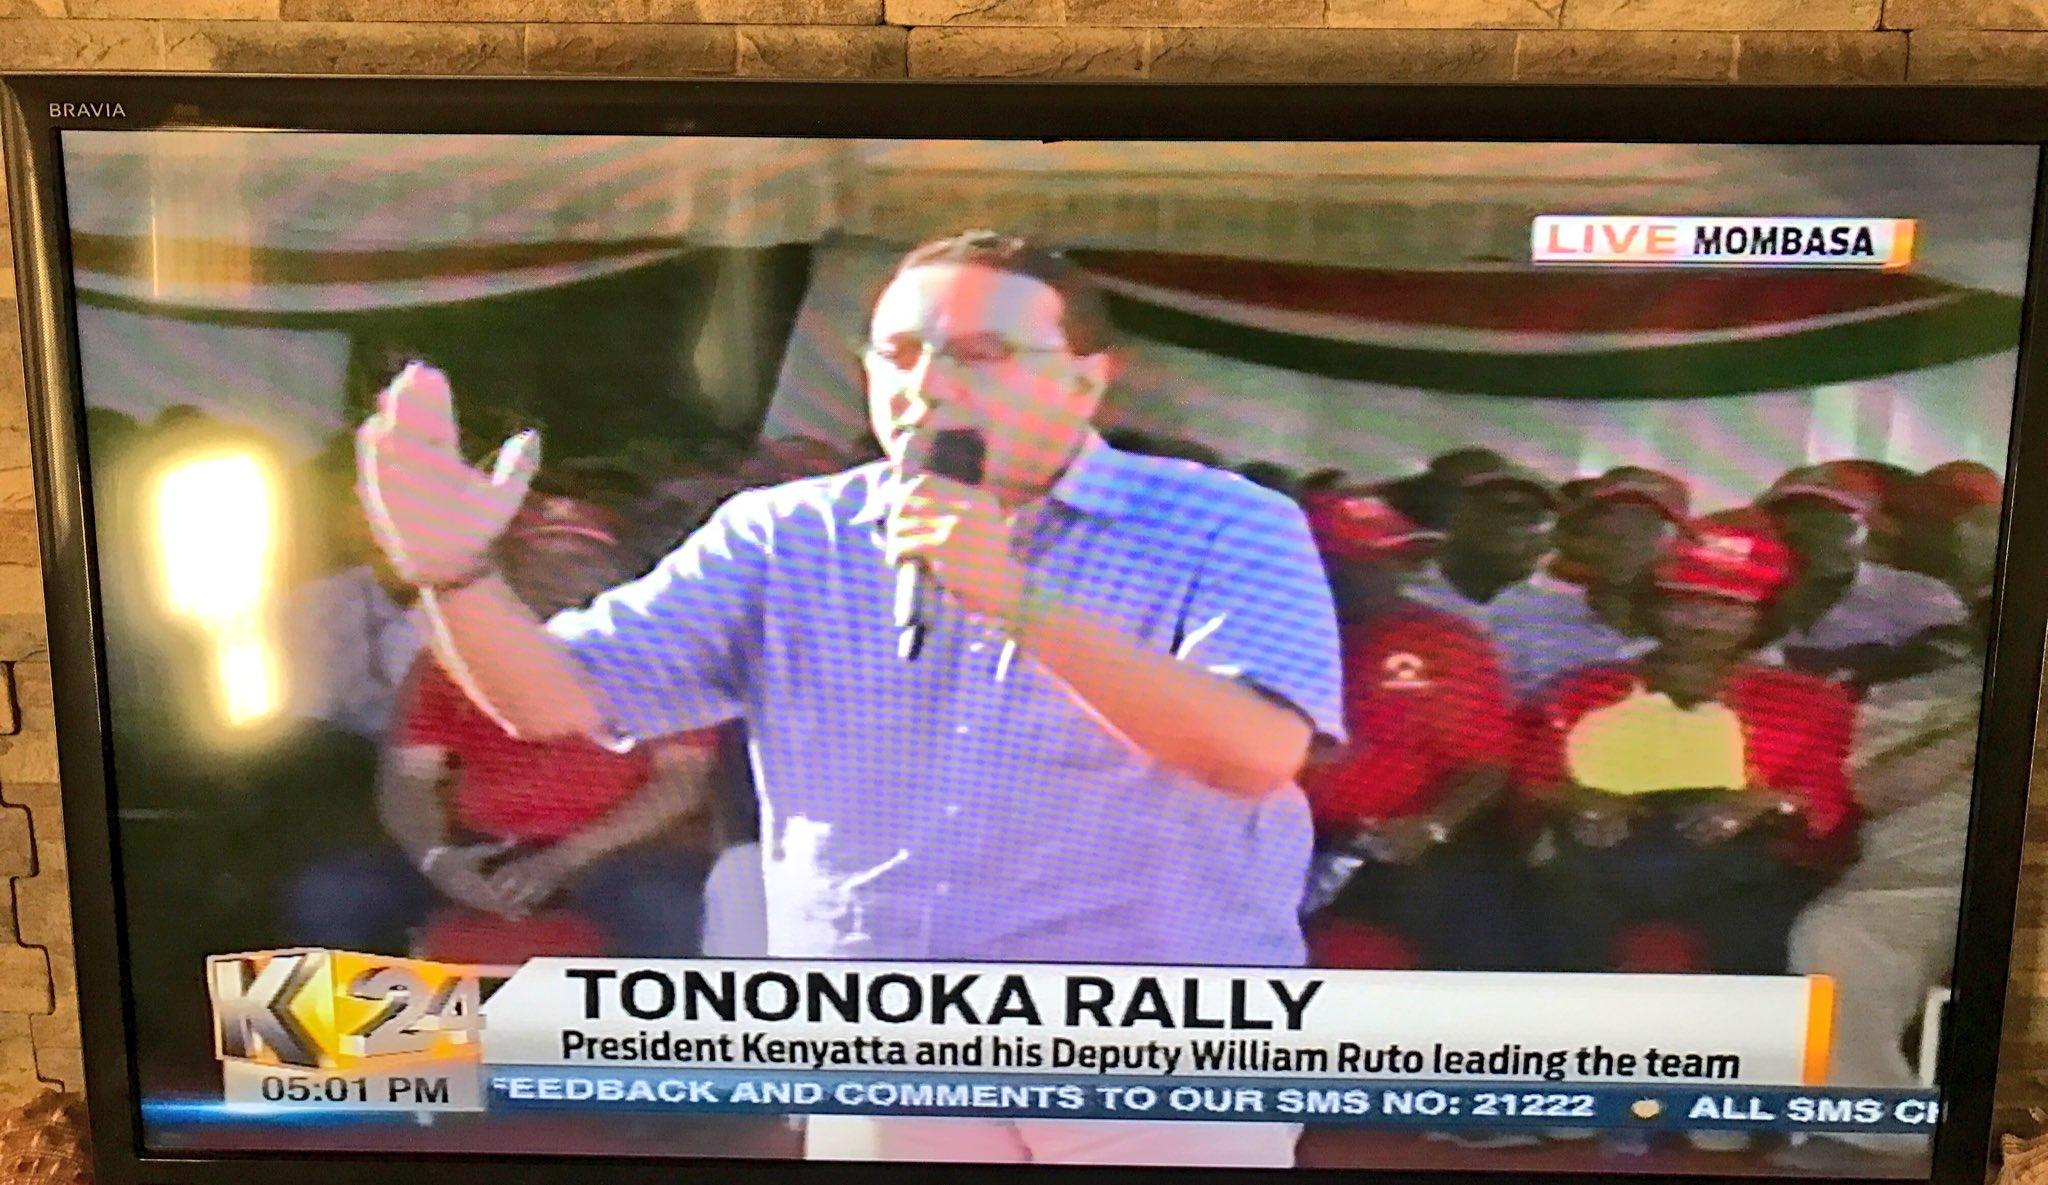 Kenyan Cabinet Secretaries Starehemp On Twitter The Kenya Constitution Forbids Cabinet